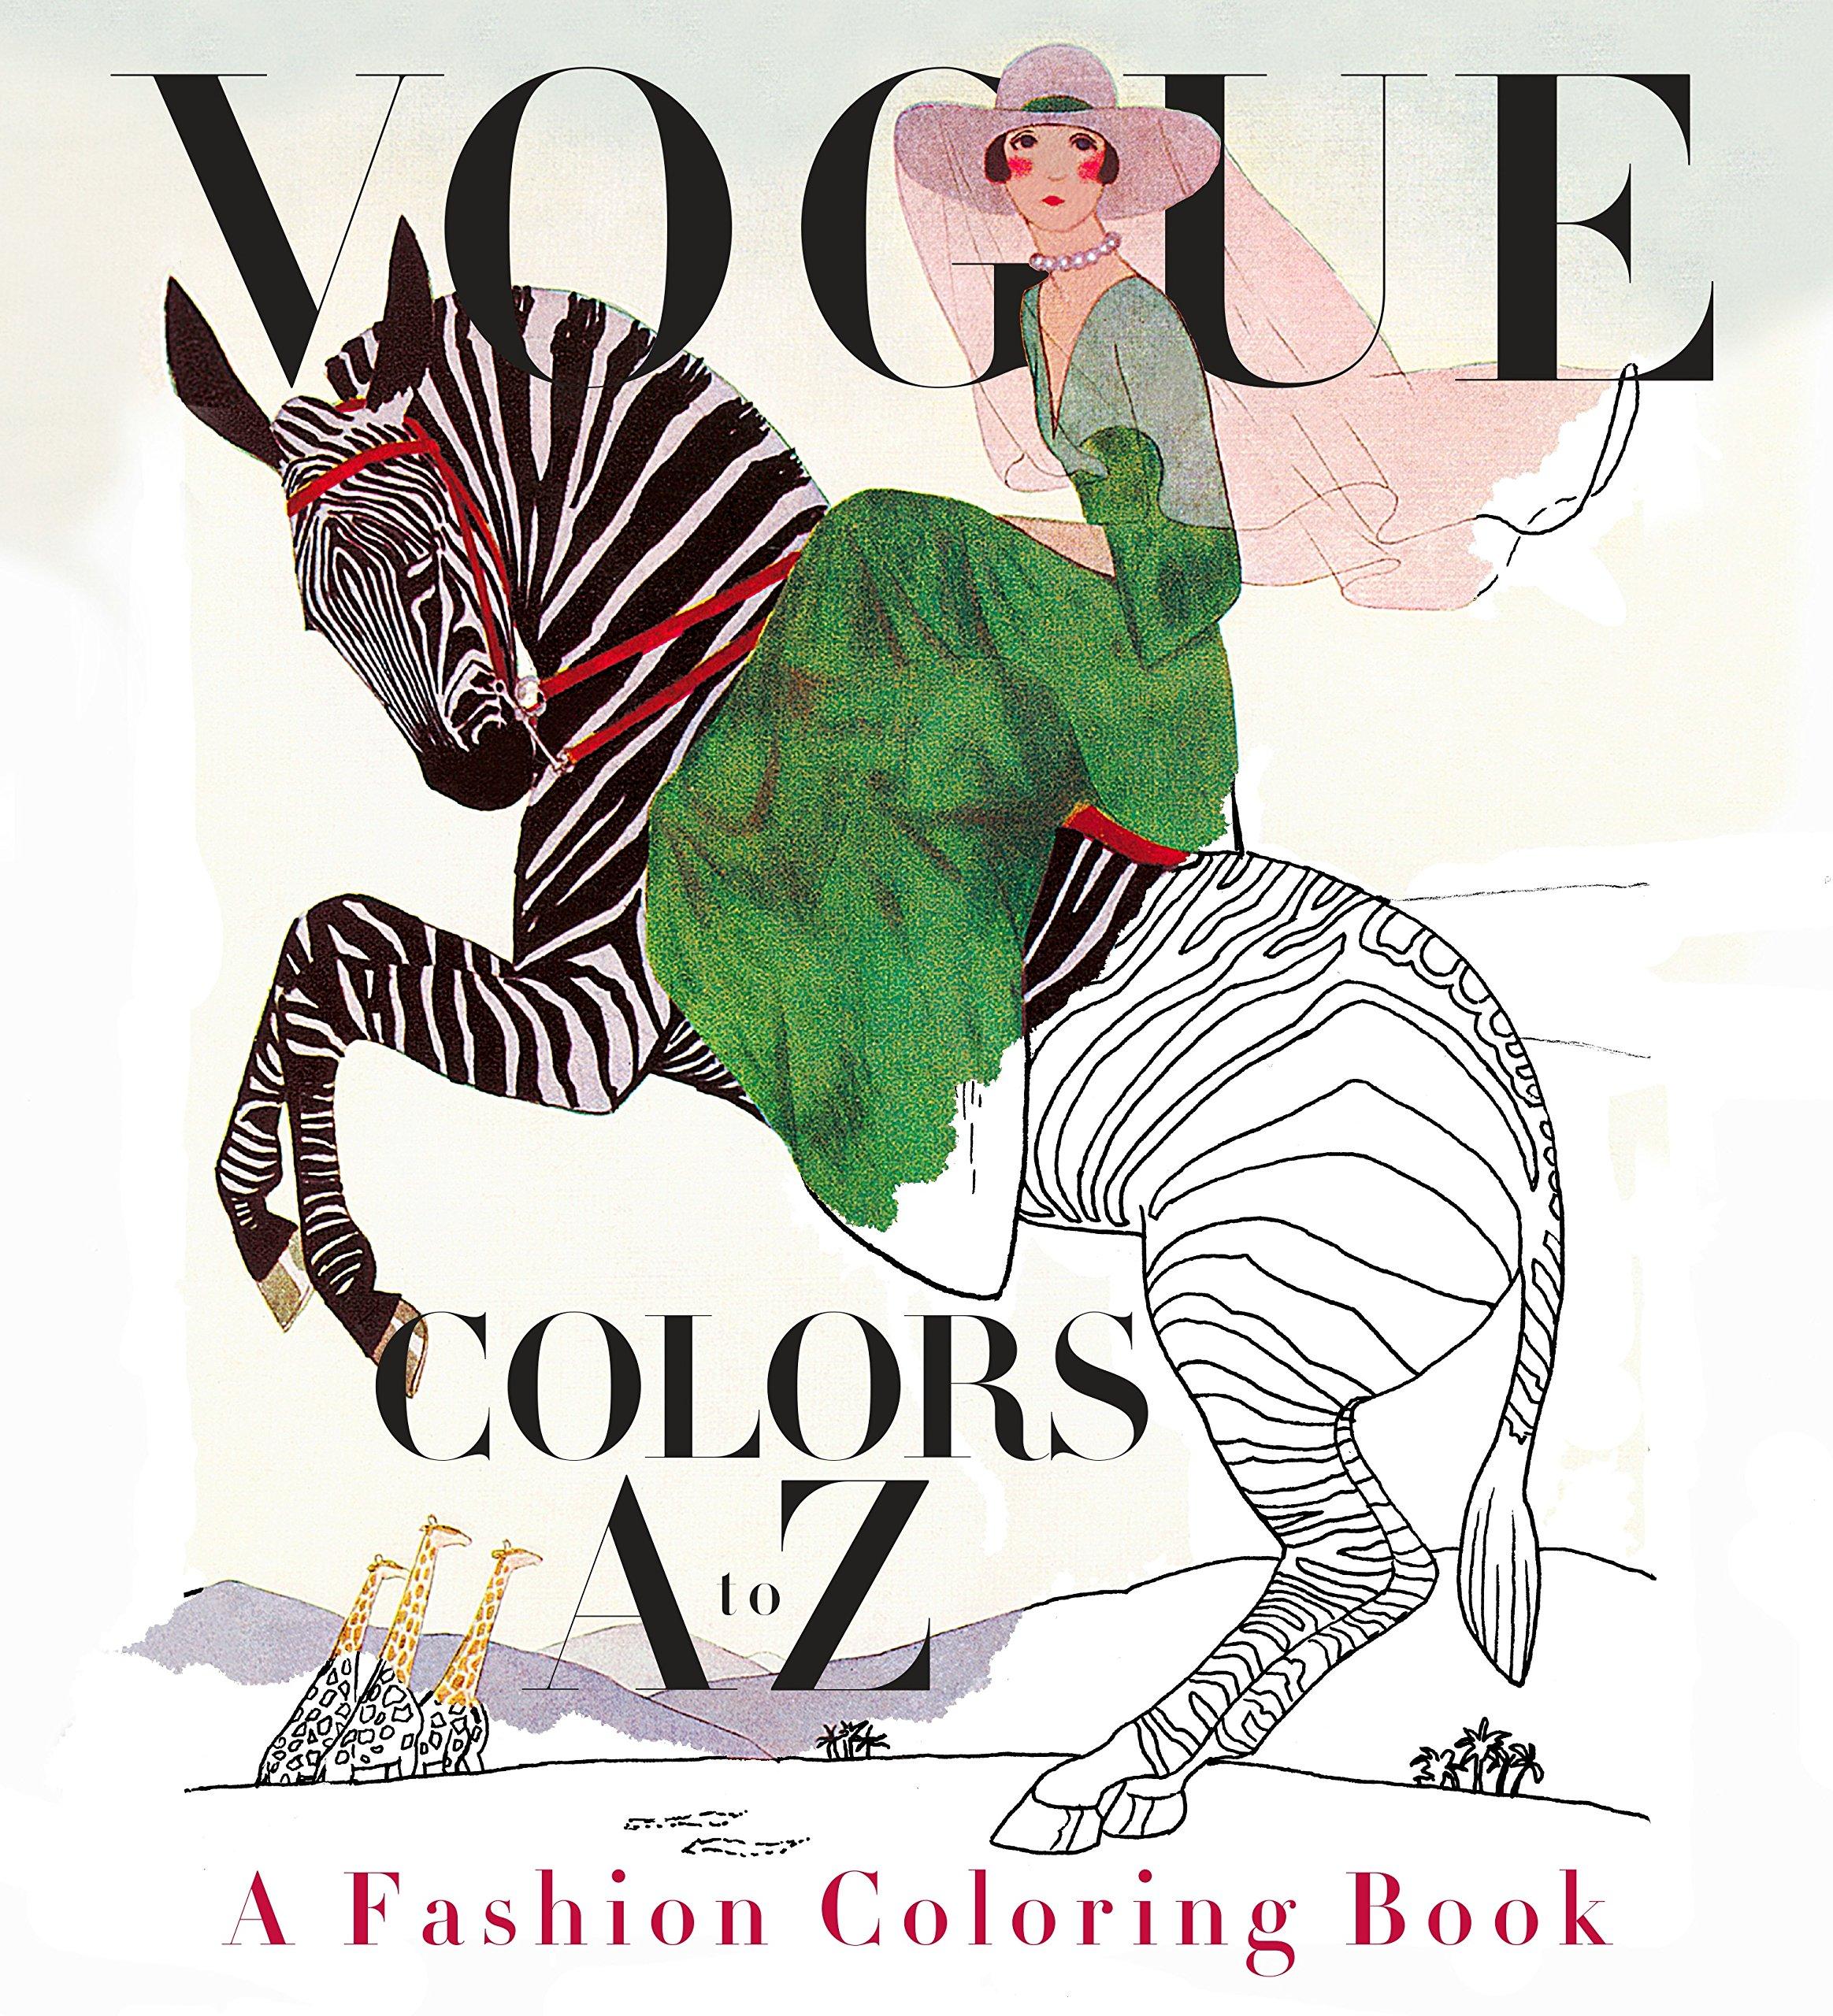 Amazon.com: Vogue Colors A to Z: A Fashion Coloring Book ...